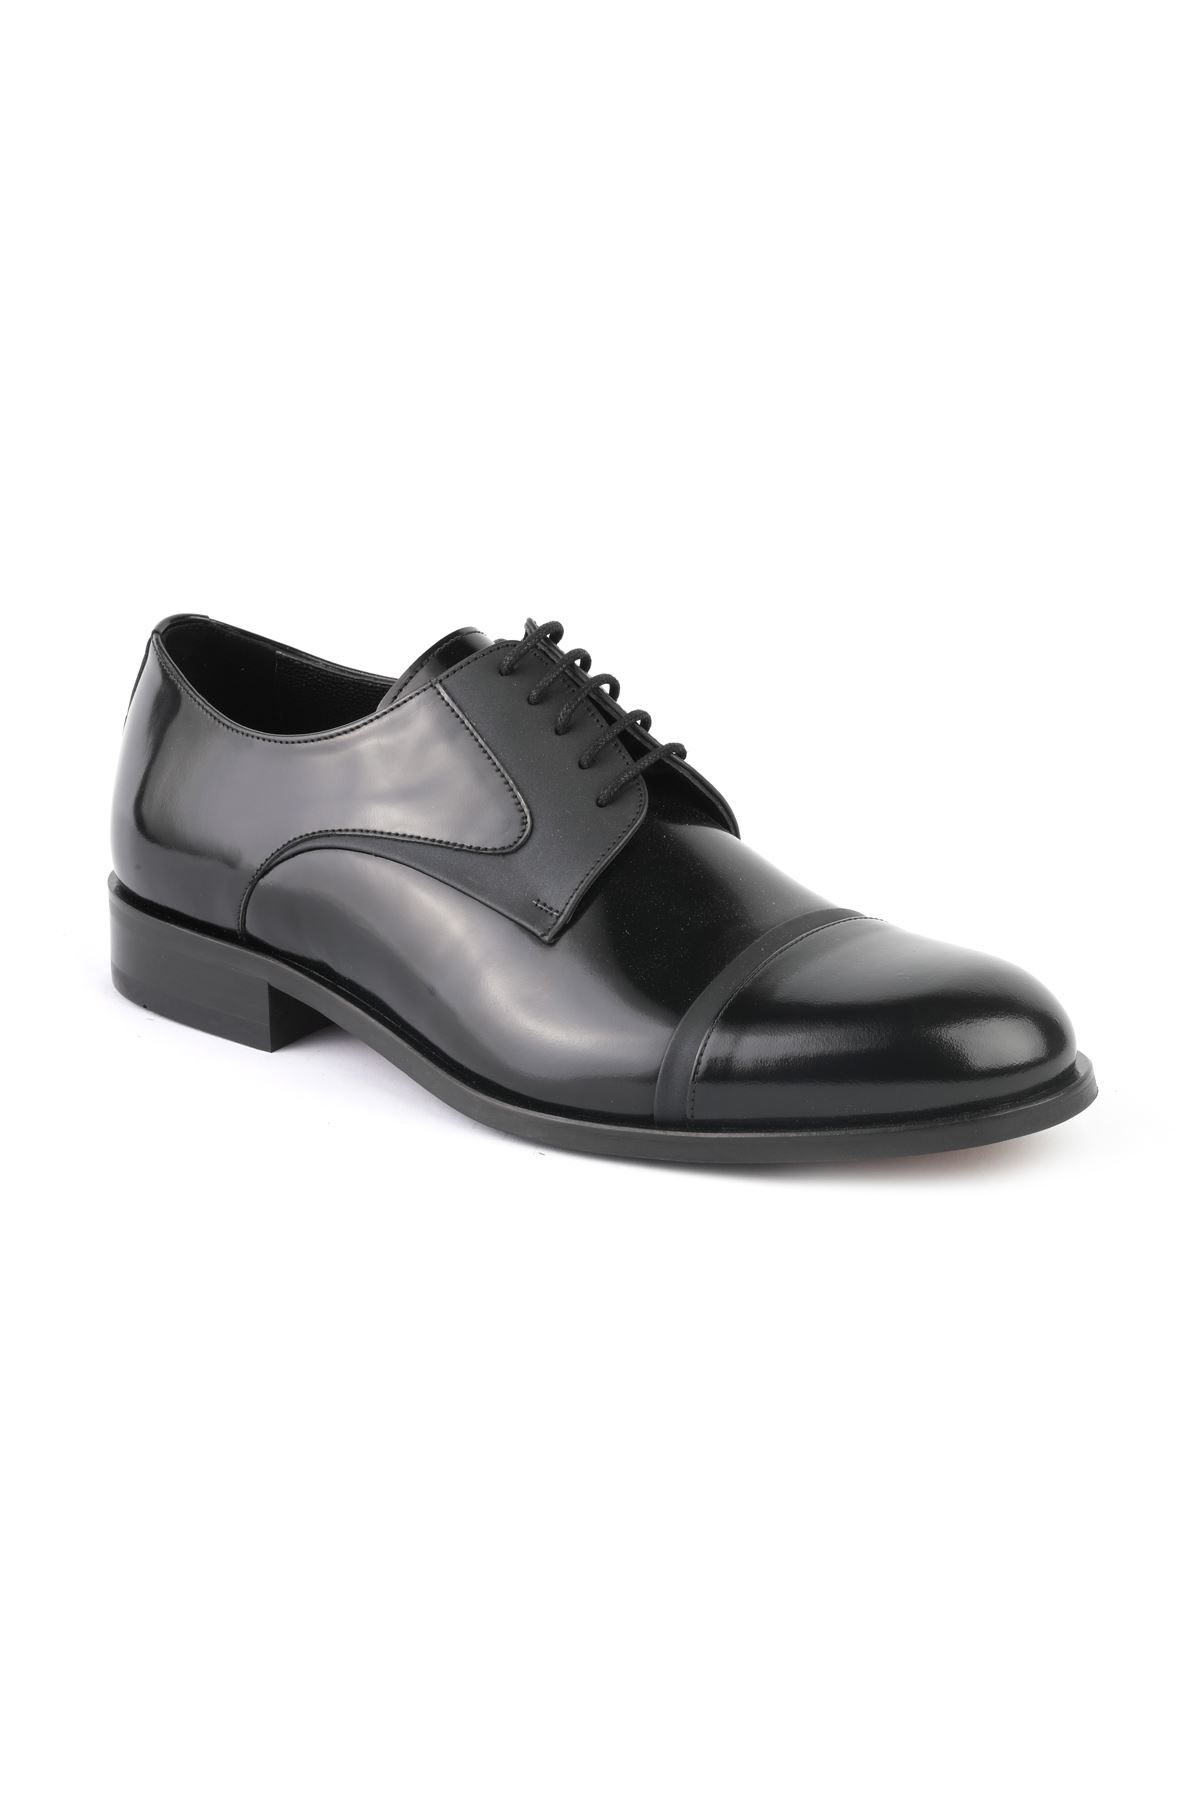 Libero T1170 Siyah Klasik Ayakkabı